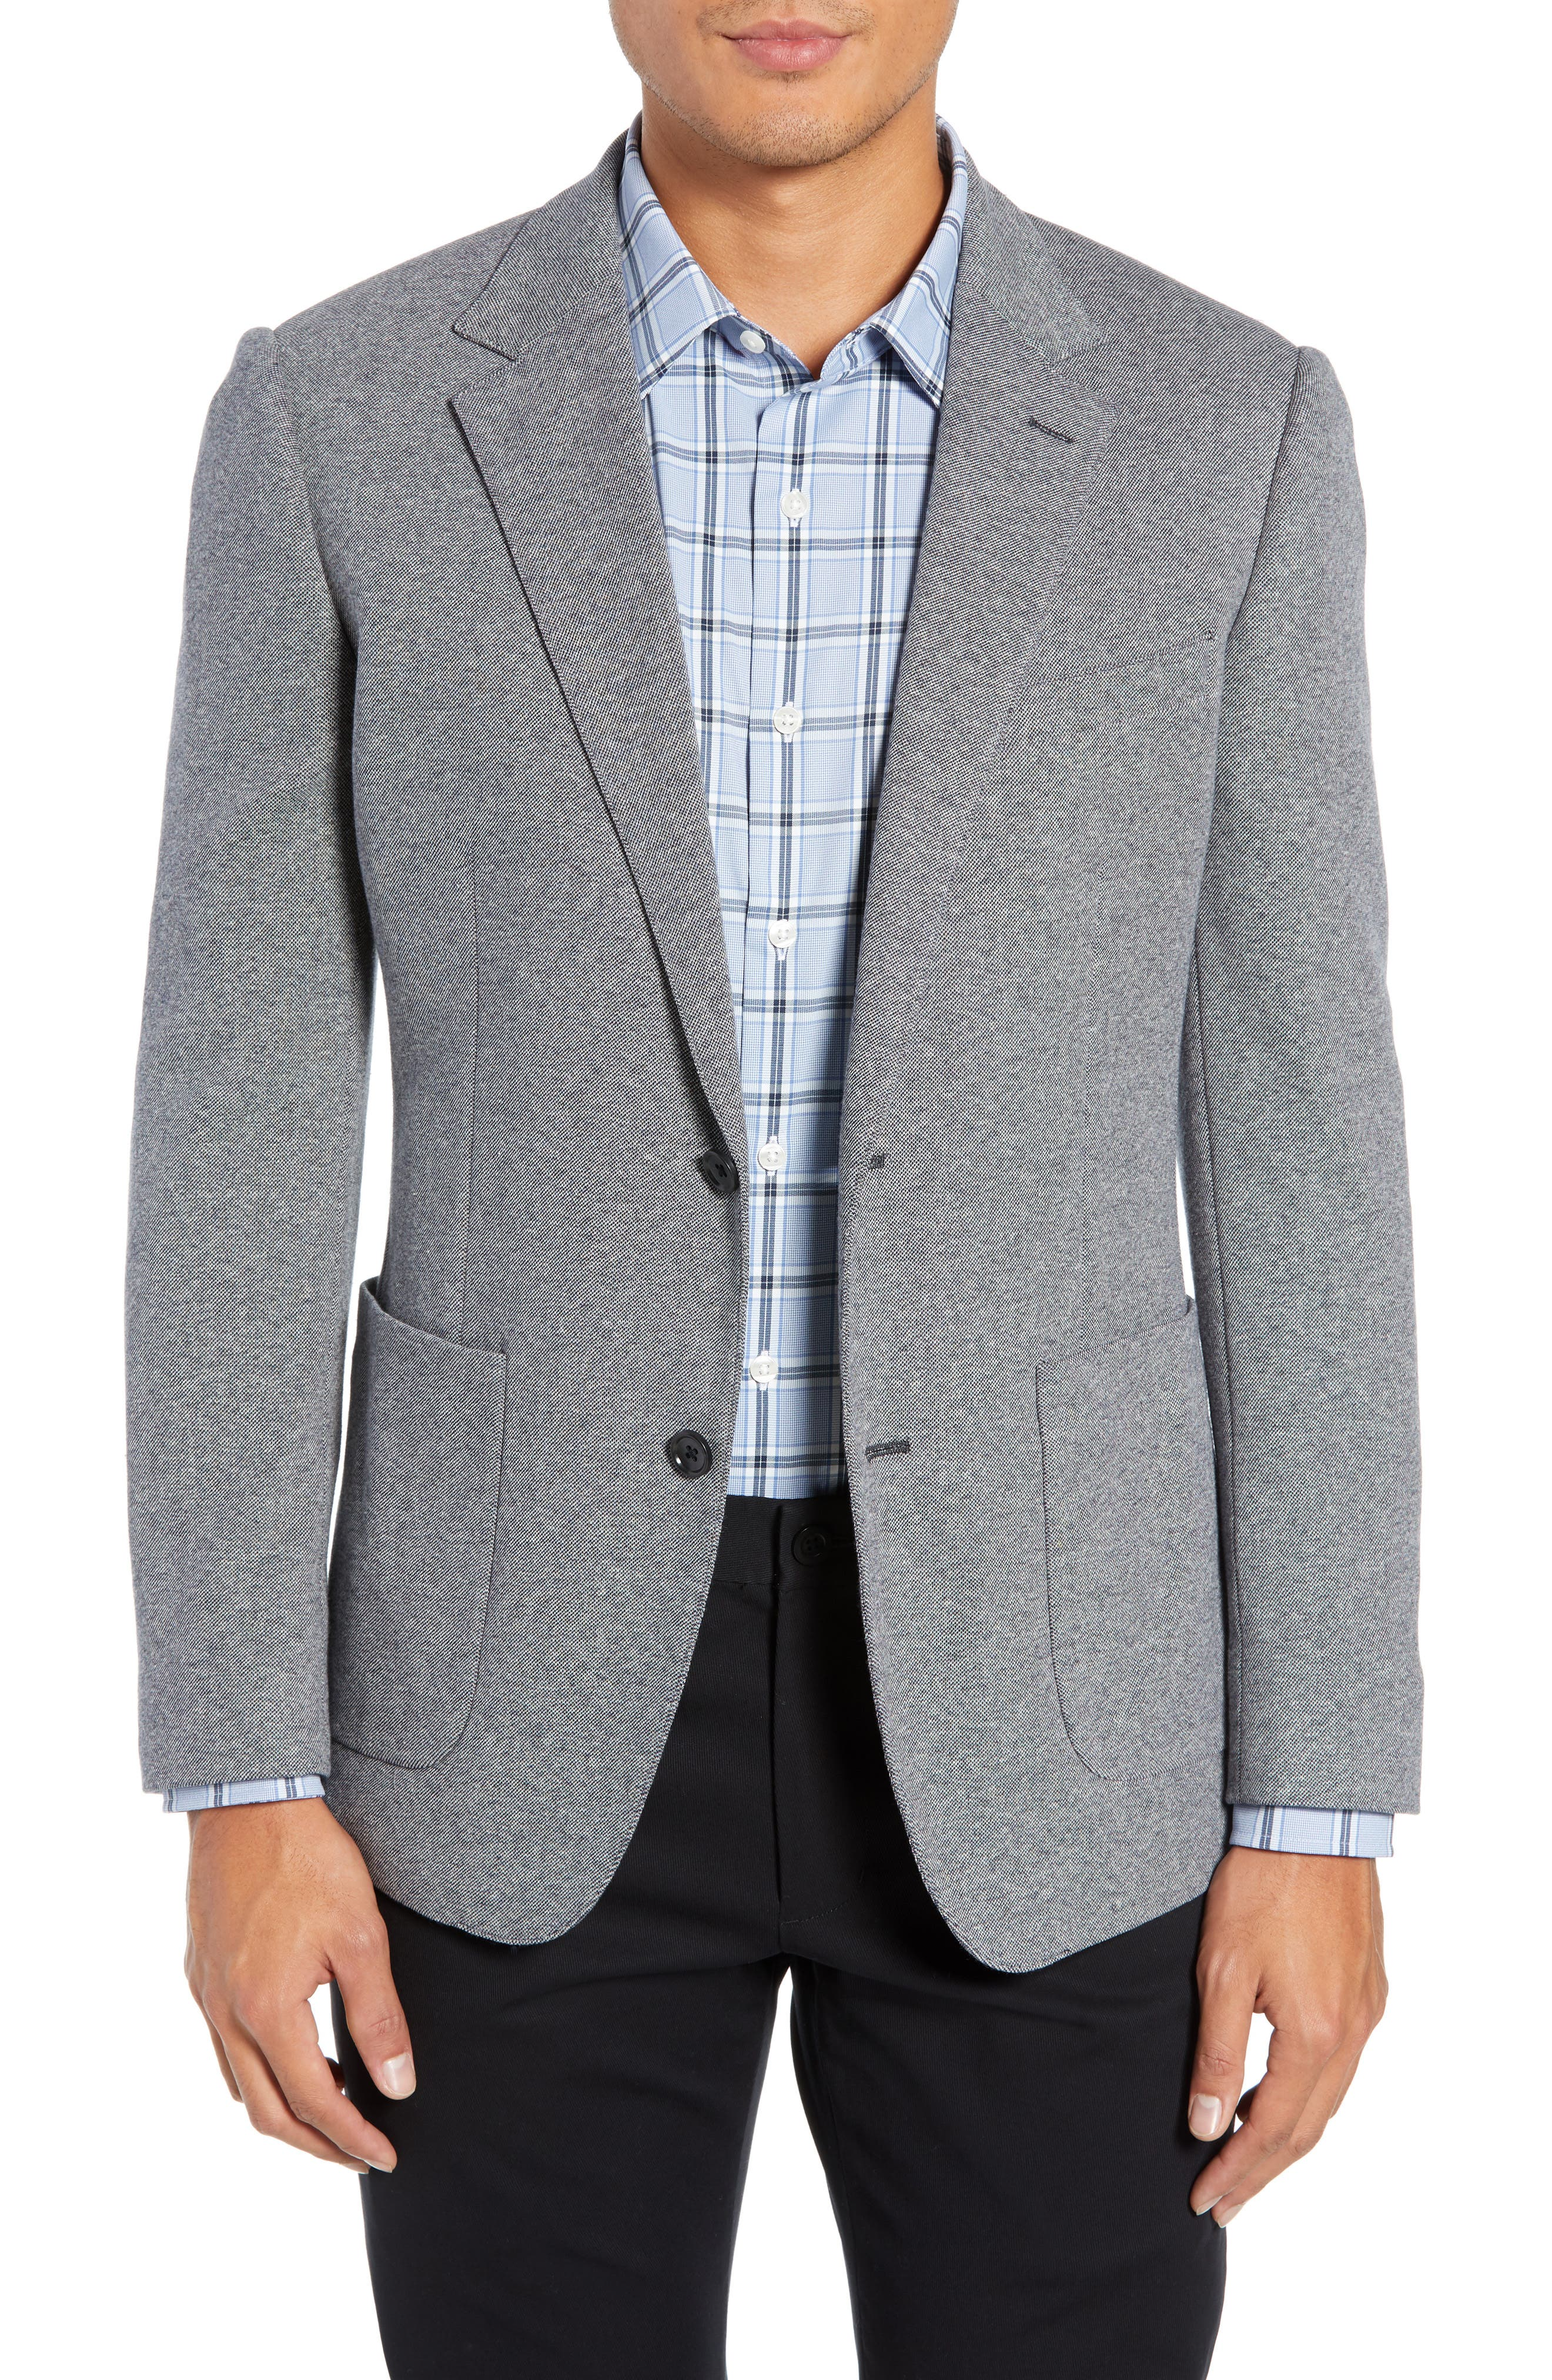 BONOBOS, Jetsetter Slim Fit Knit Cotton Sport Coat, Main thumbnail 1, color, LIGHT GREY